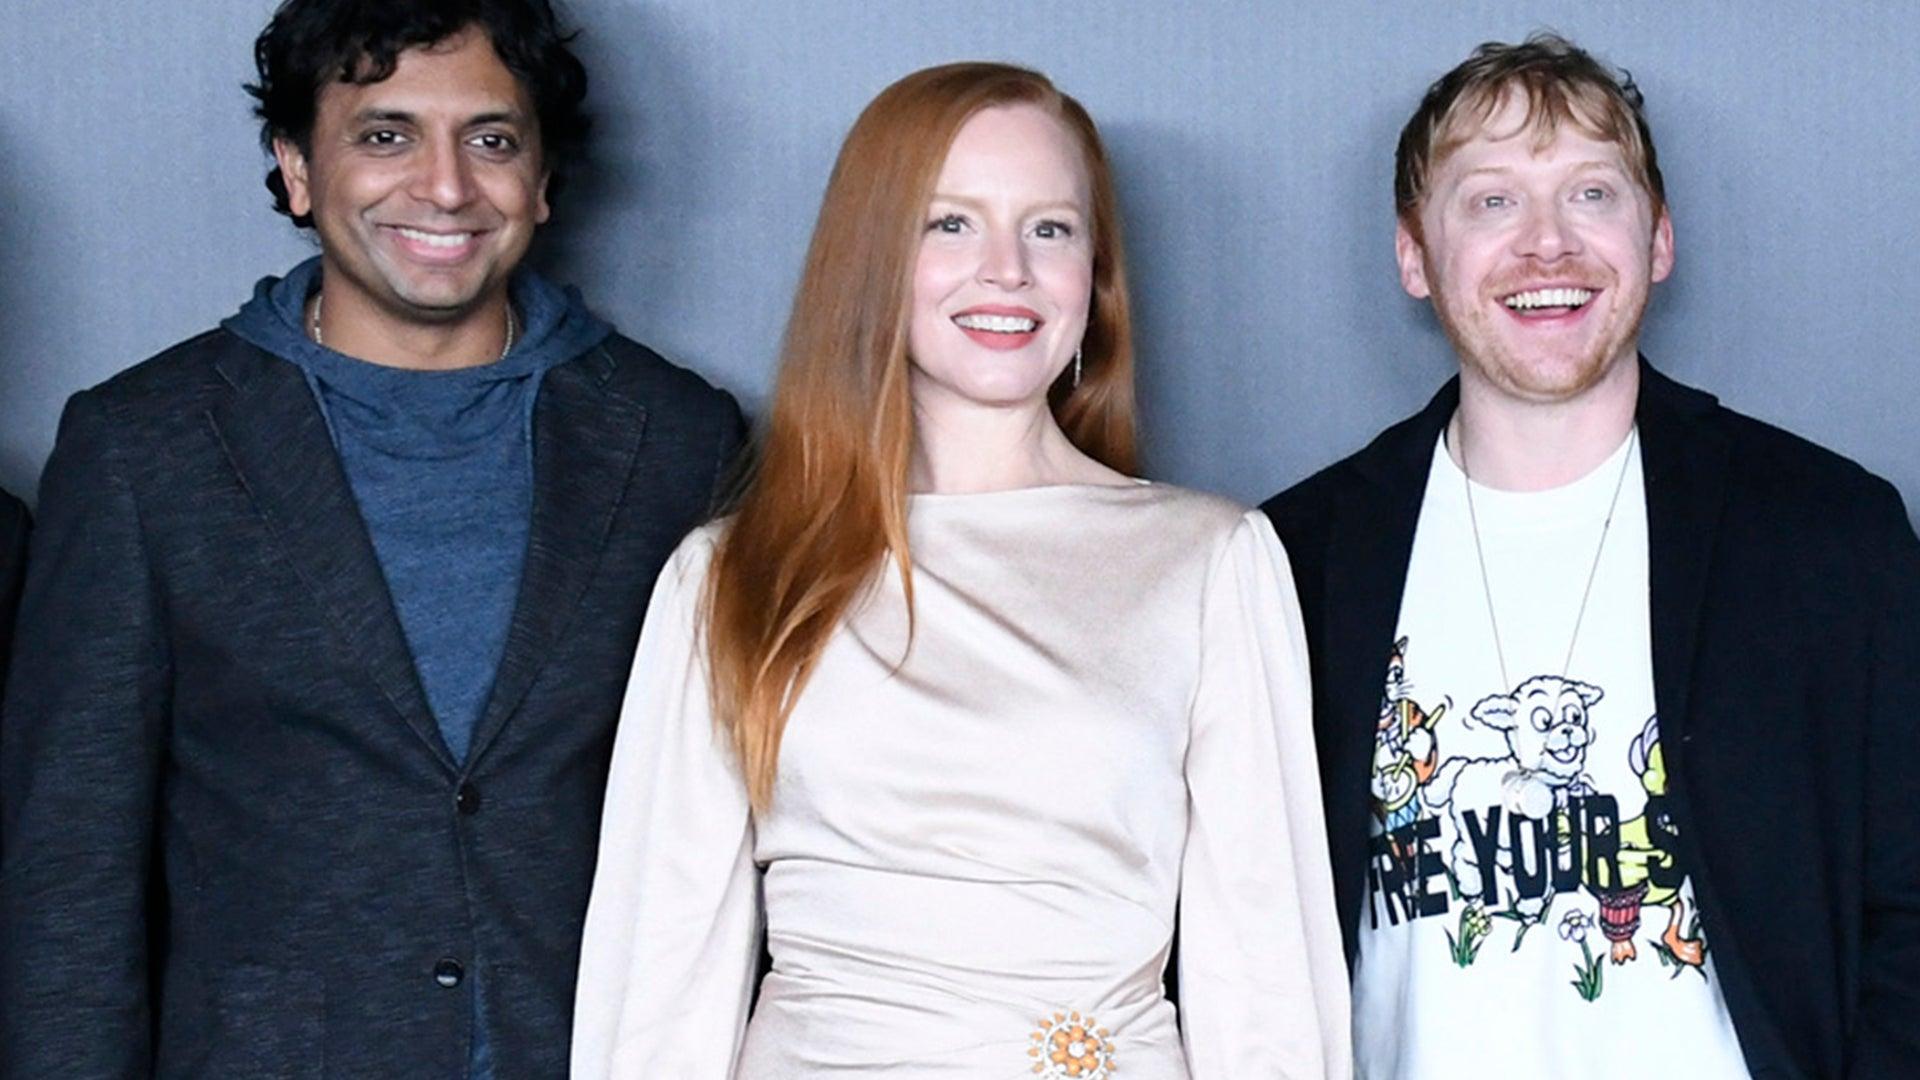 M. Night Shyamalan, Lauren Ambrose, and Rupert Grint